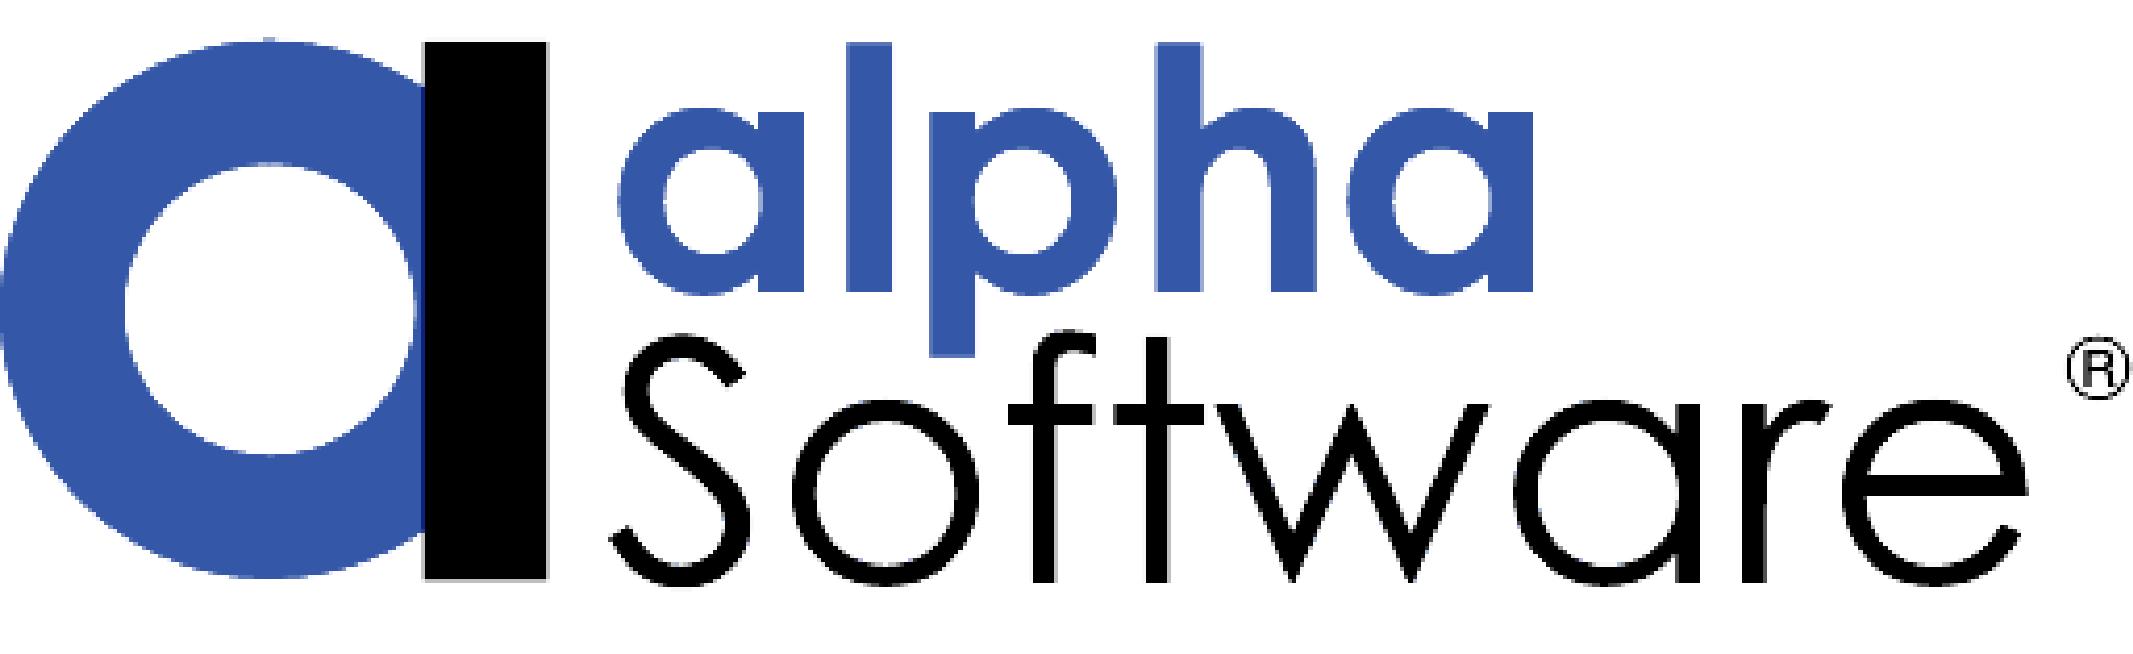 Survey Design Software  Design A Successful Survey System